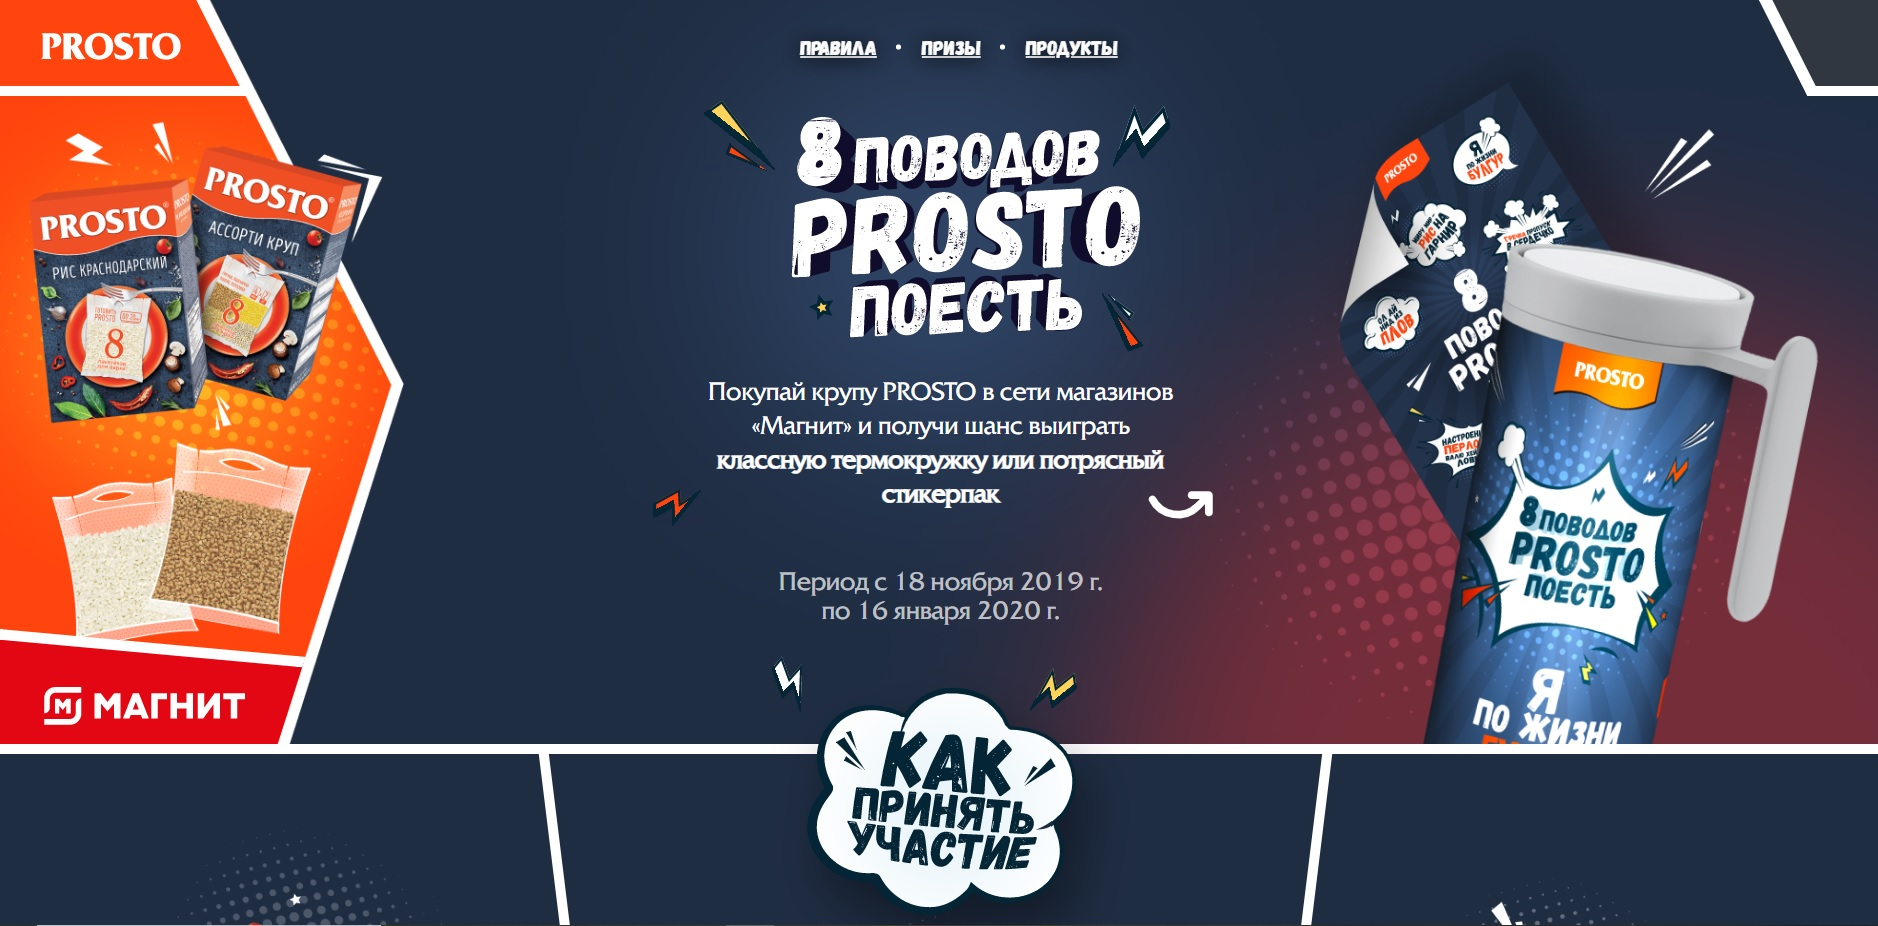 krupa-prosto.ru акция 2019 года